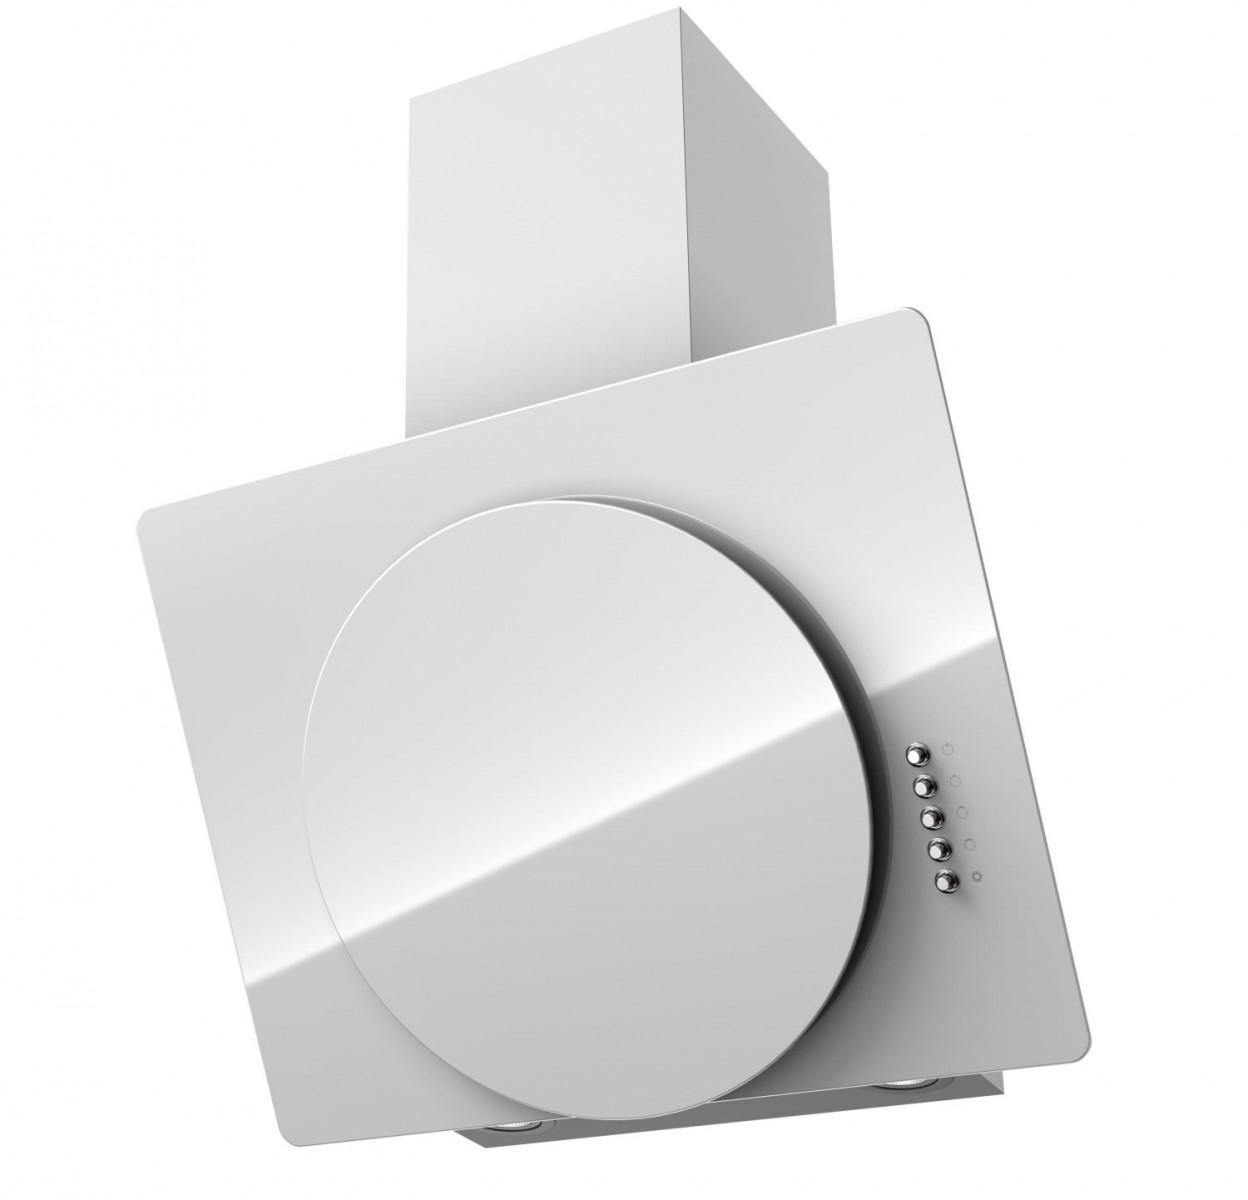 Вытяжка KRONA FINA 600 WHITE PB - Апис плюс